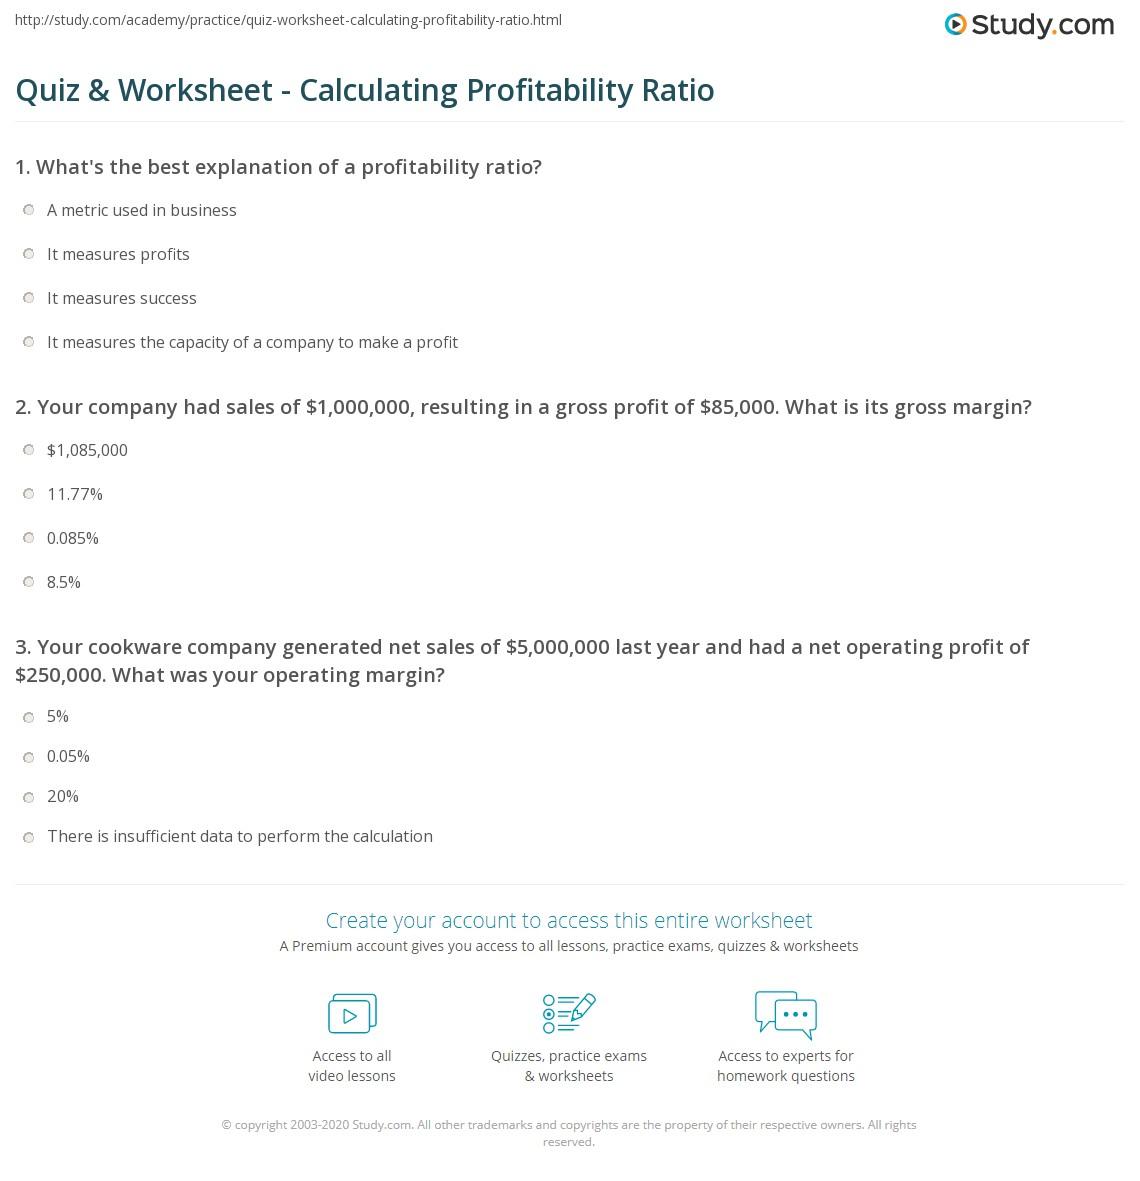 Quiz & Worksheet - Calculating Profitability Ratio | Study.com